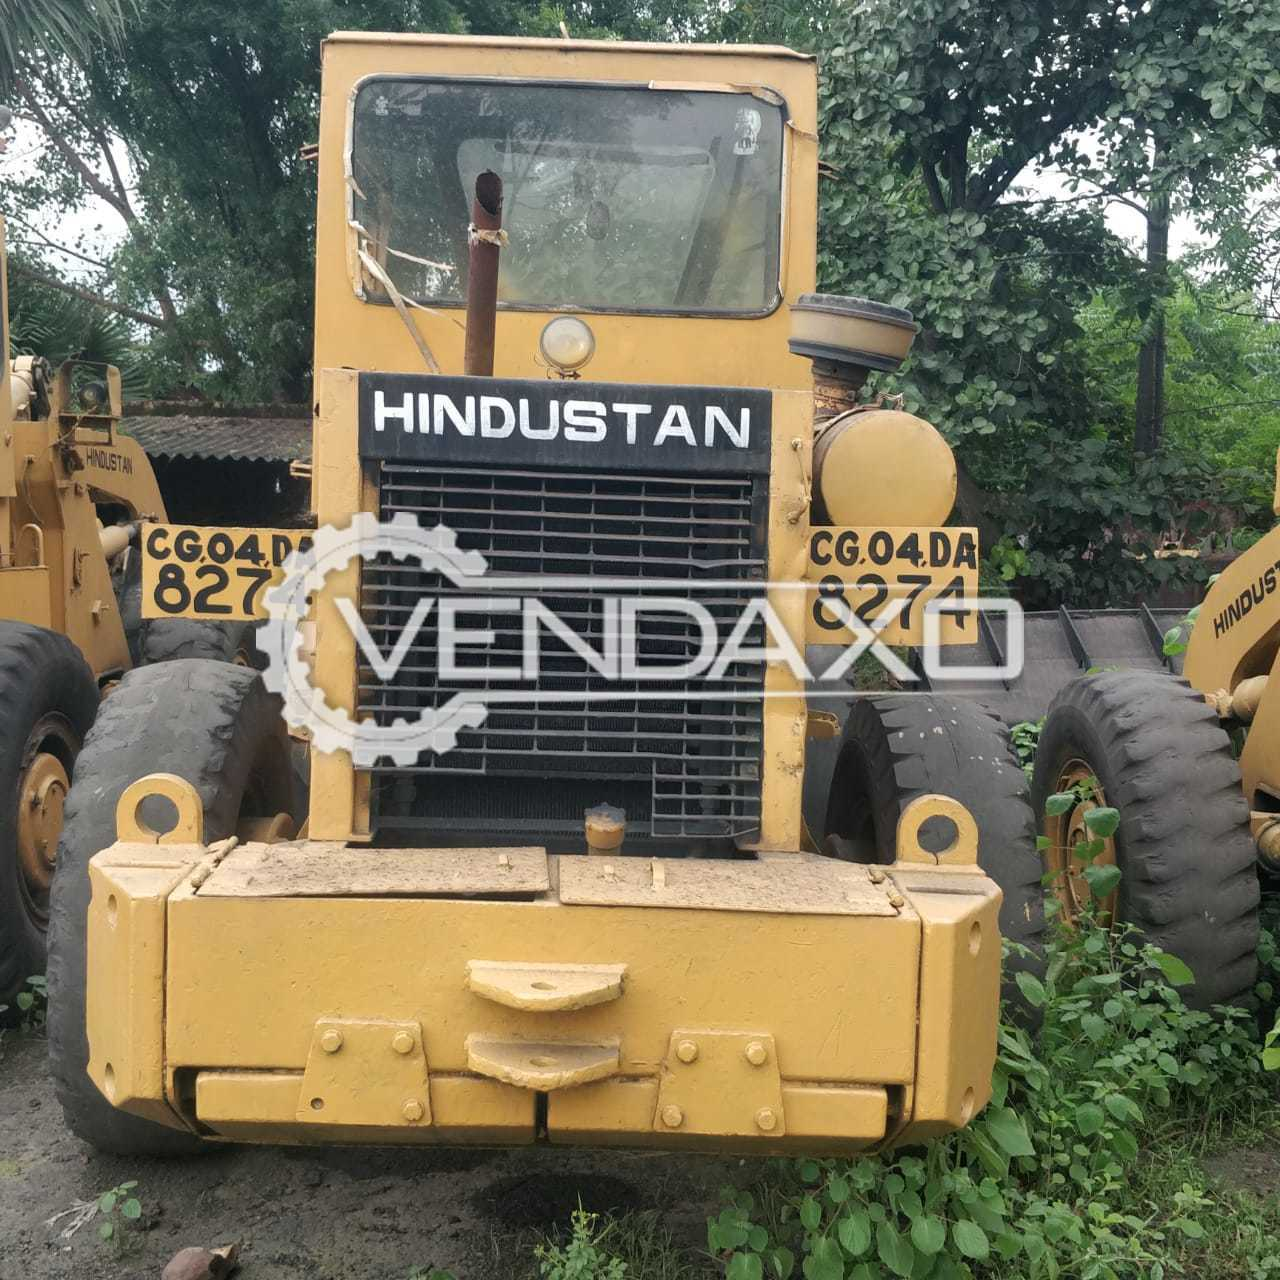 For Sale Used Hindustan HM-2021 Wheel Loader Machine - 112 HP, 2007 Model